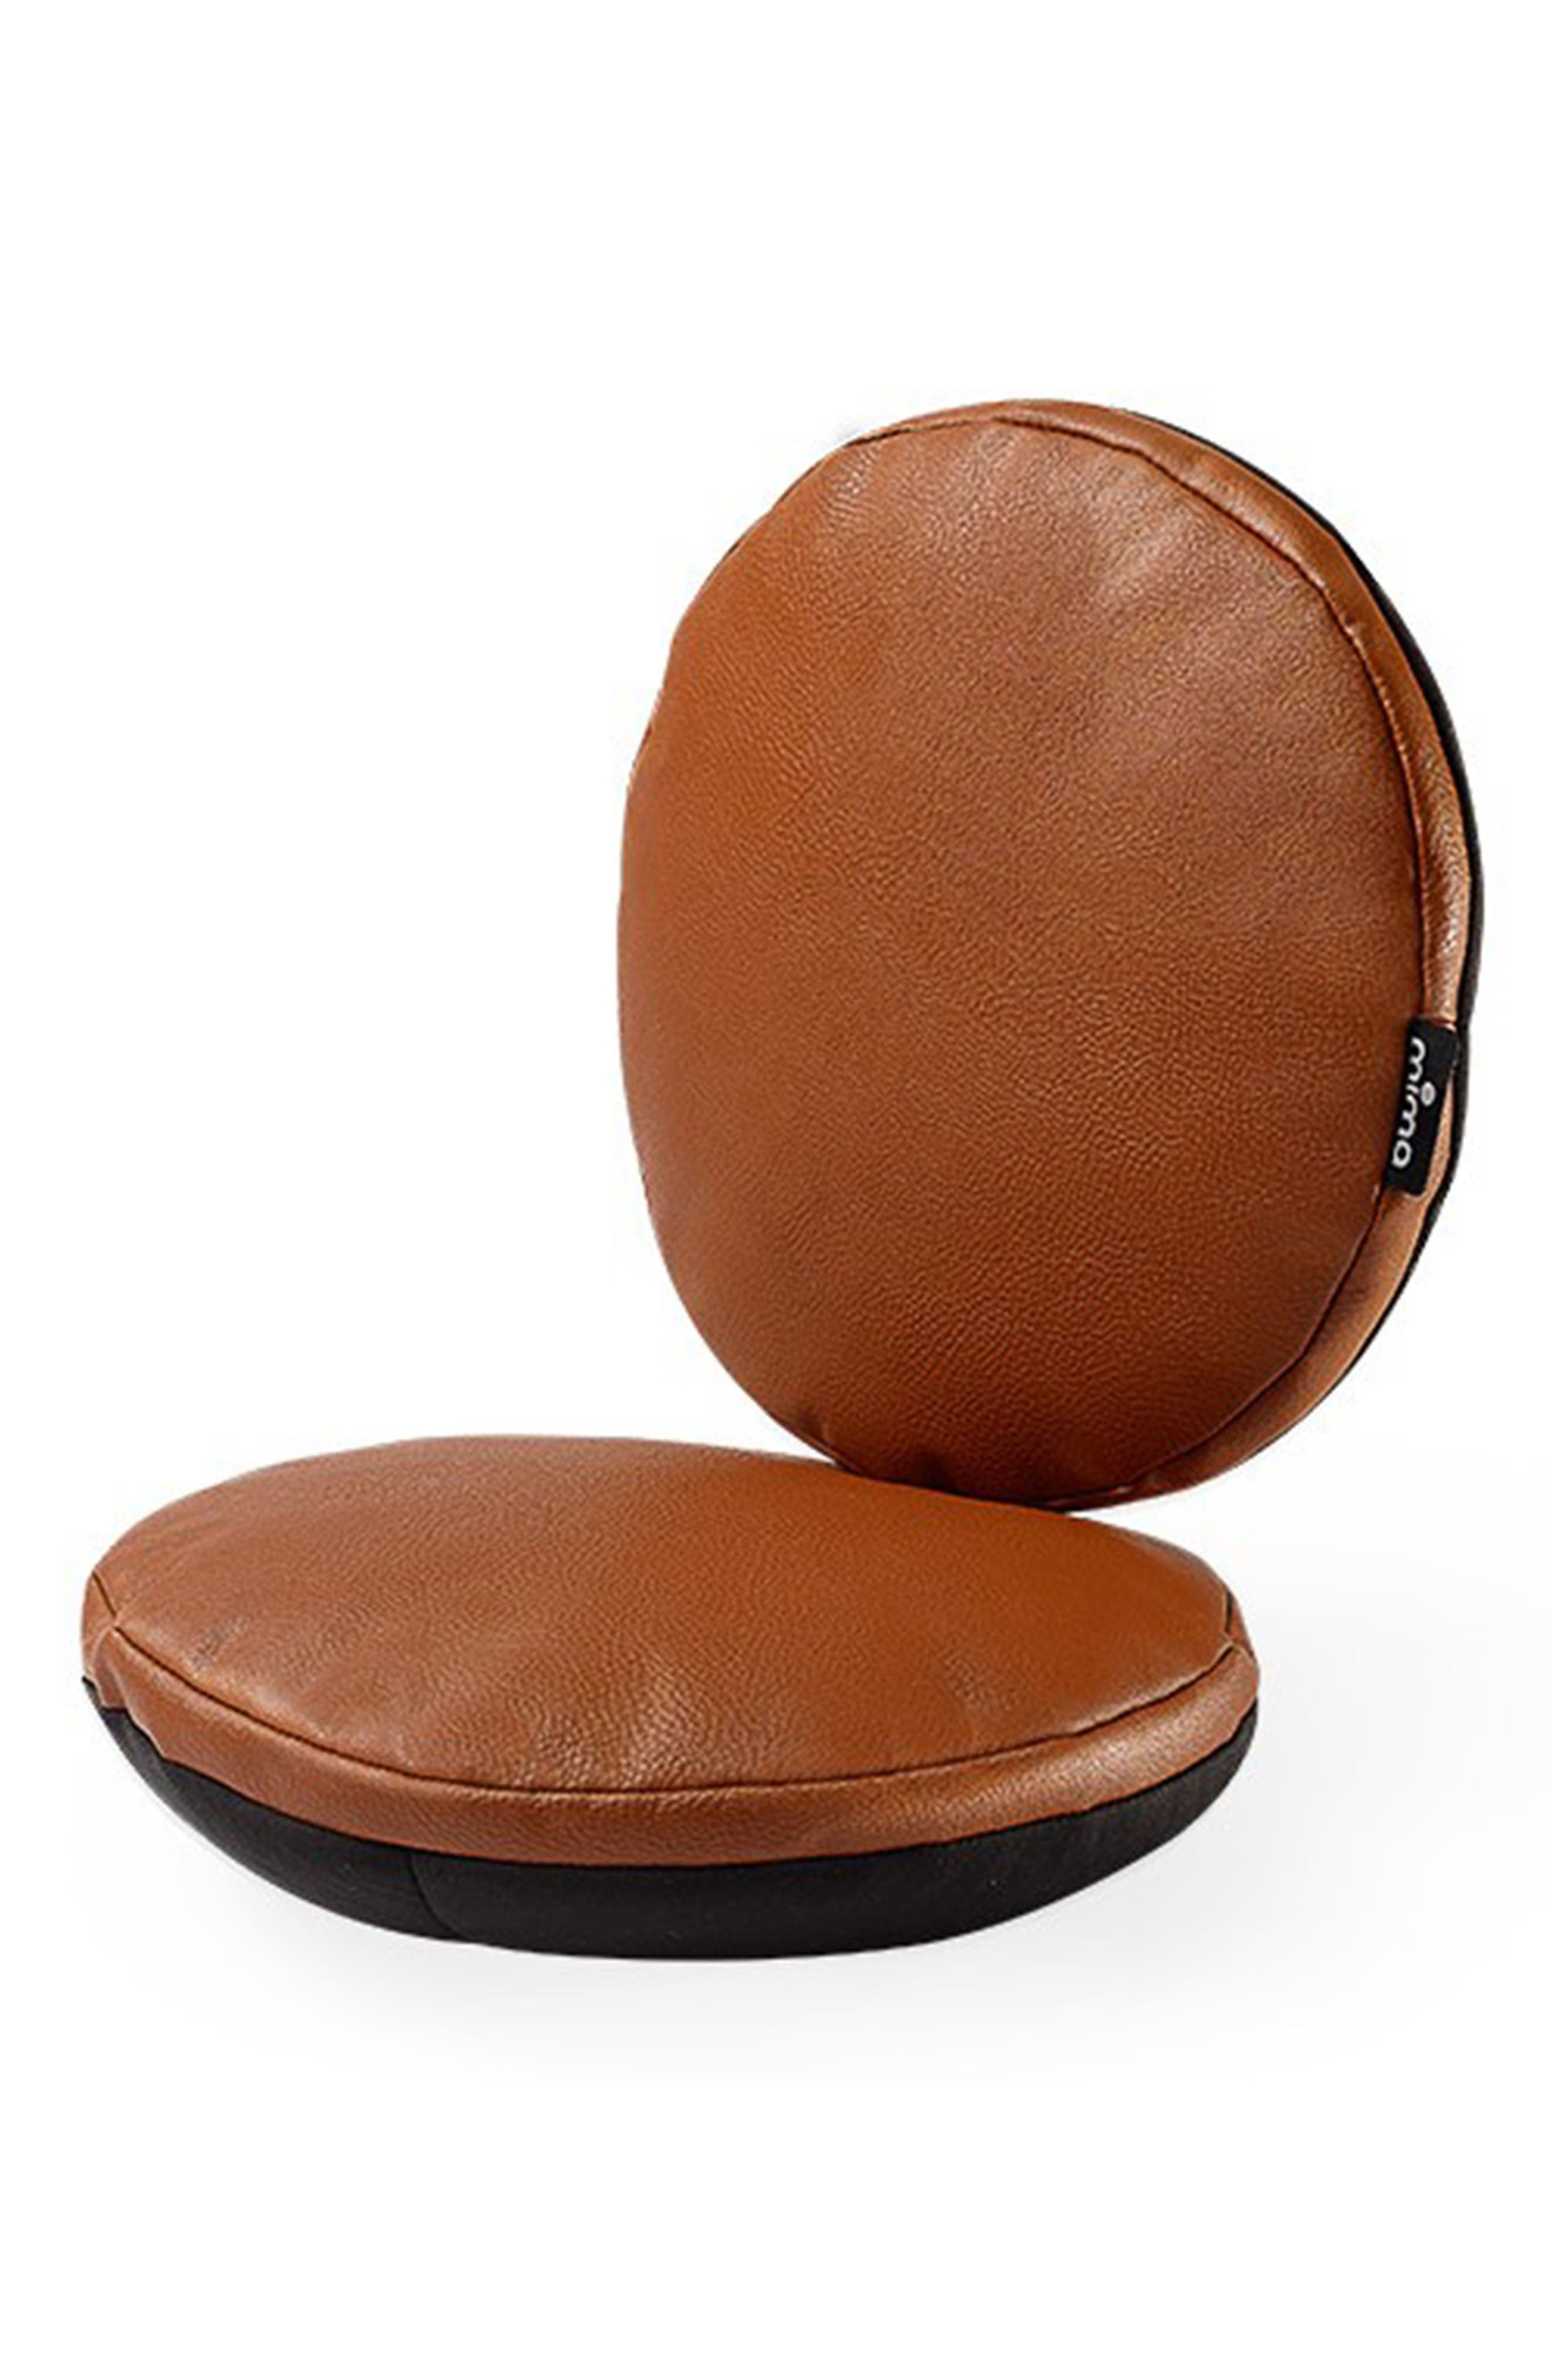 Alternate Image 1 Selected - Mima Moon Junior Highchair Seat Cushion